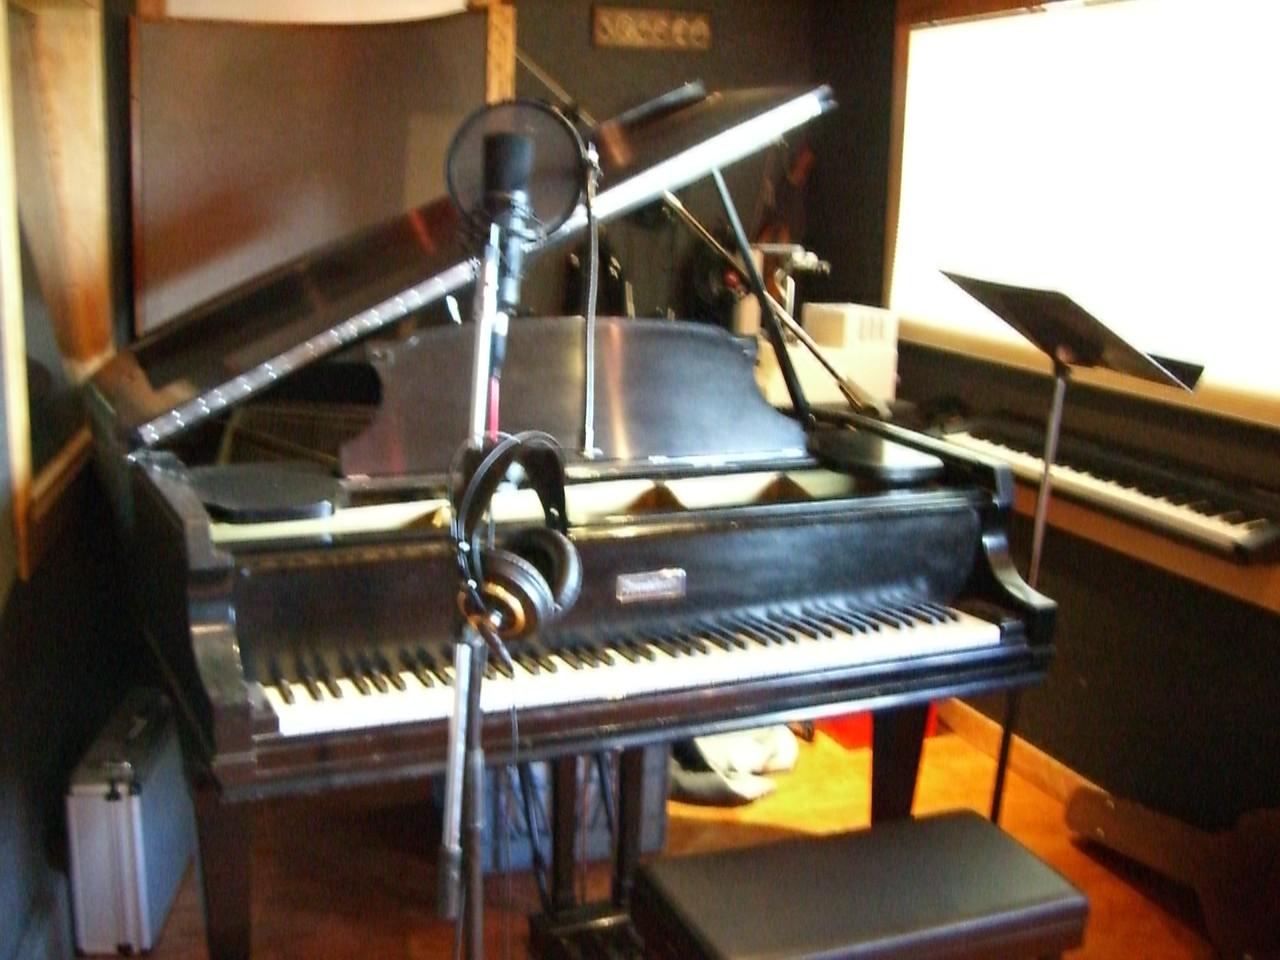 2006 03 01 Wed - At Bill Hare's studio - Piano & mic